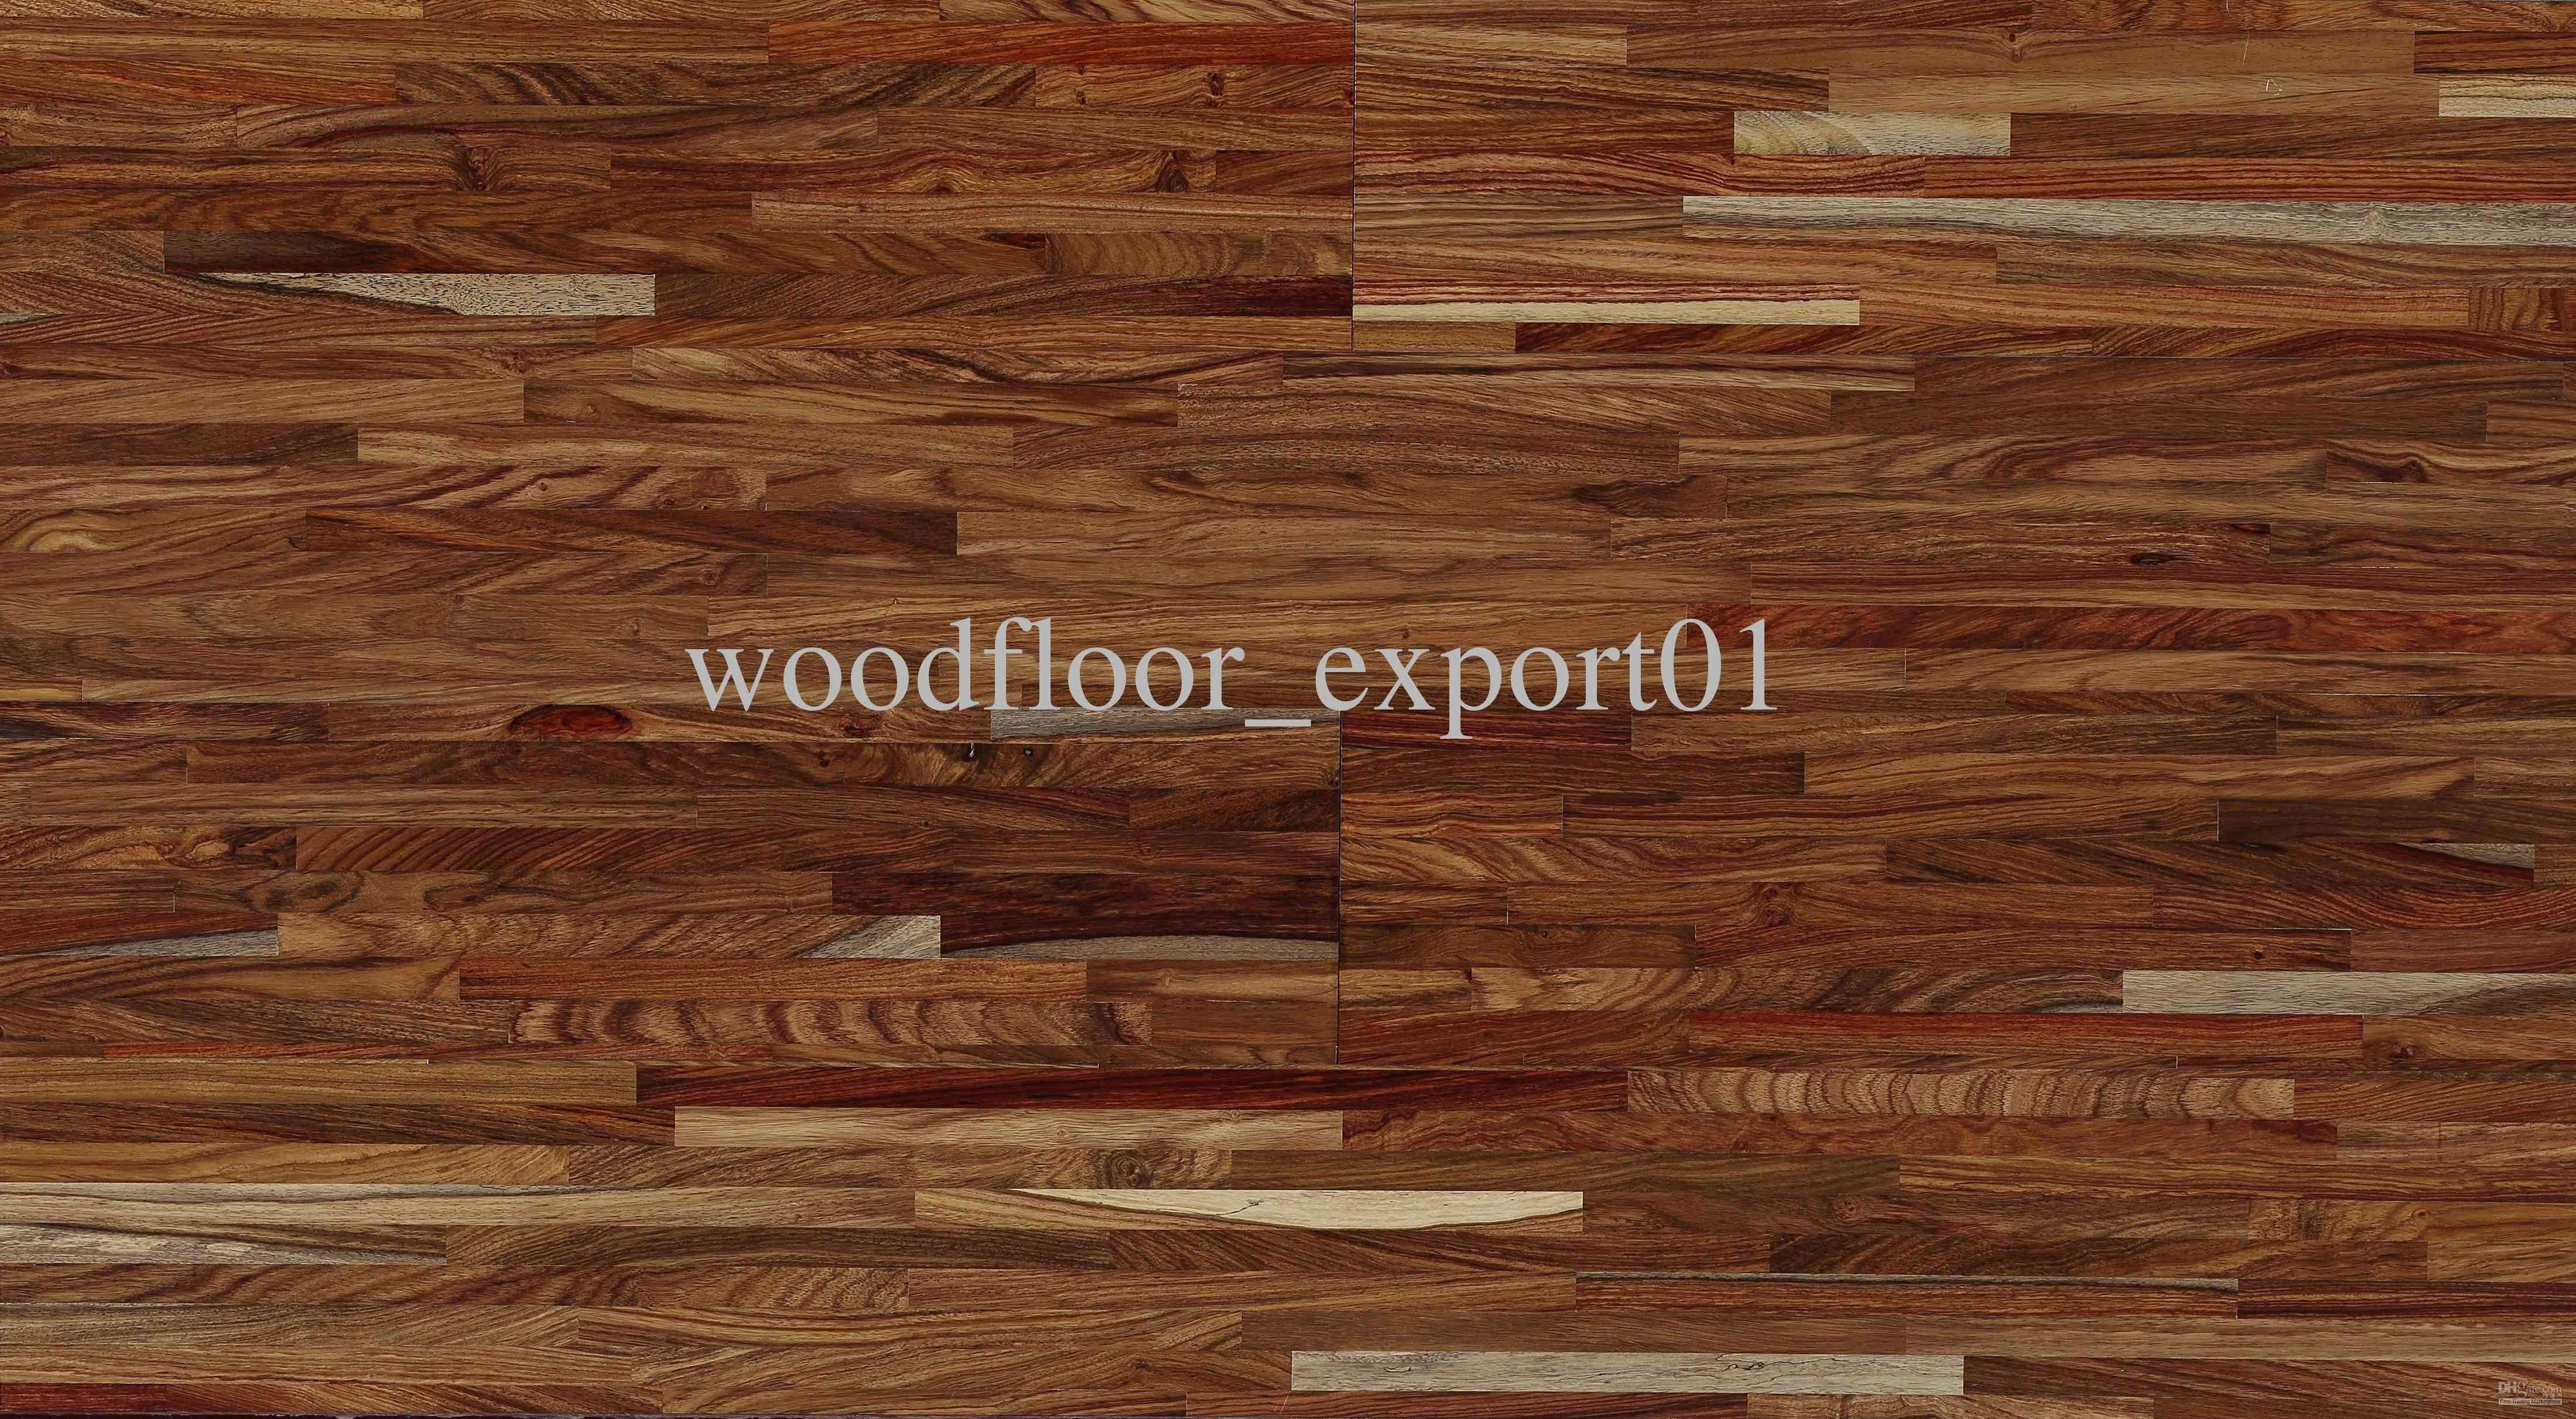 walnut hardwood flooring pros cons of 19 awesome pergo vs hardwood pics dizpos com with 50 lovely hardwood floor options 50 s